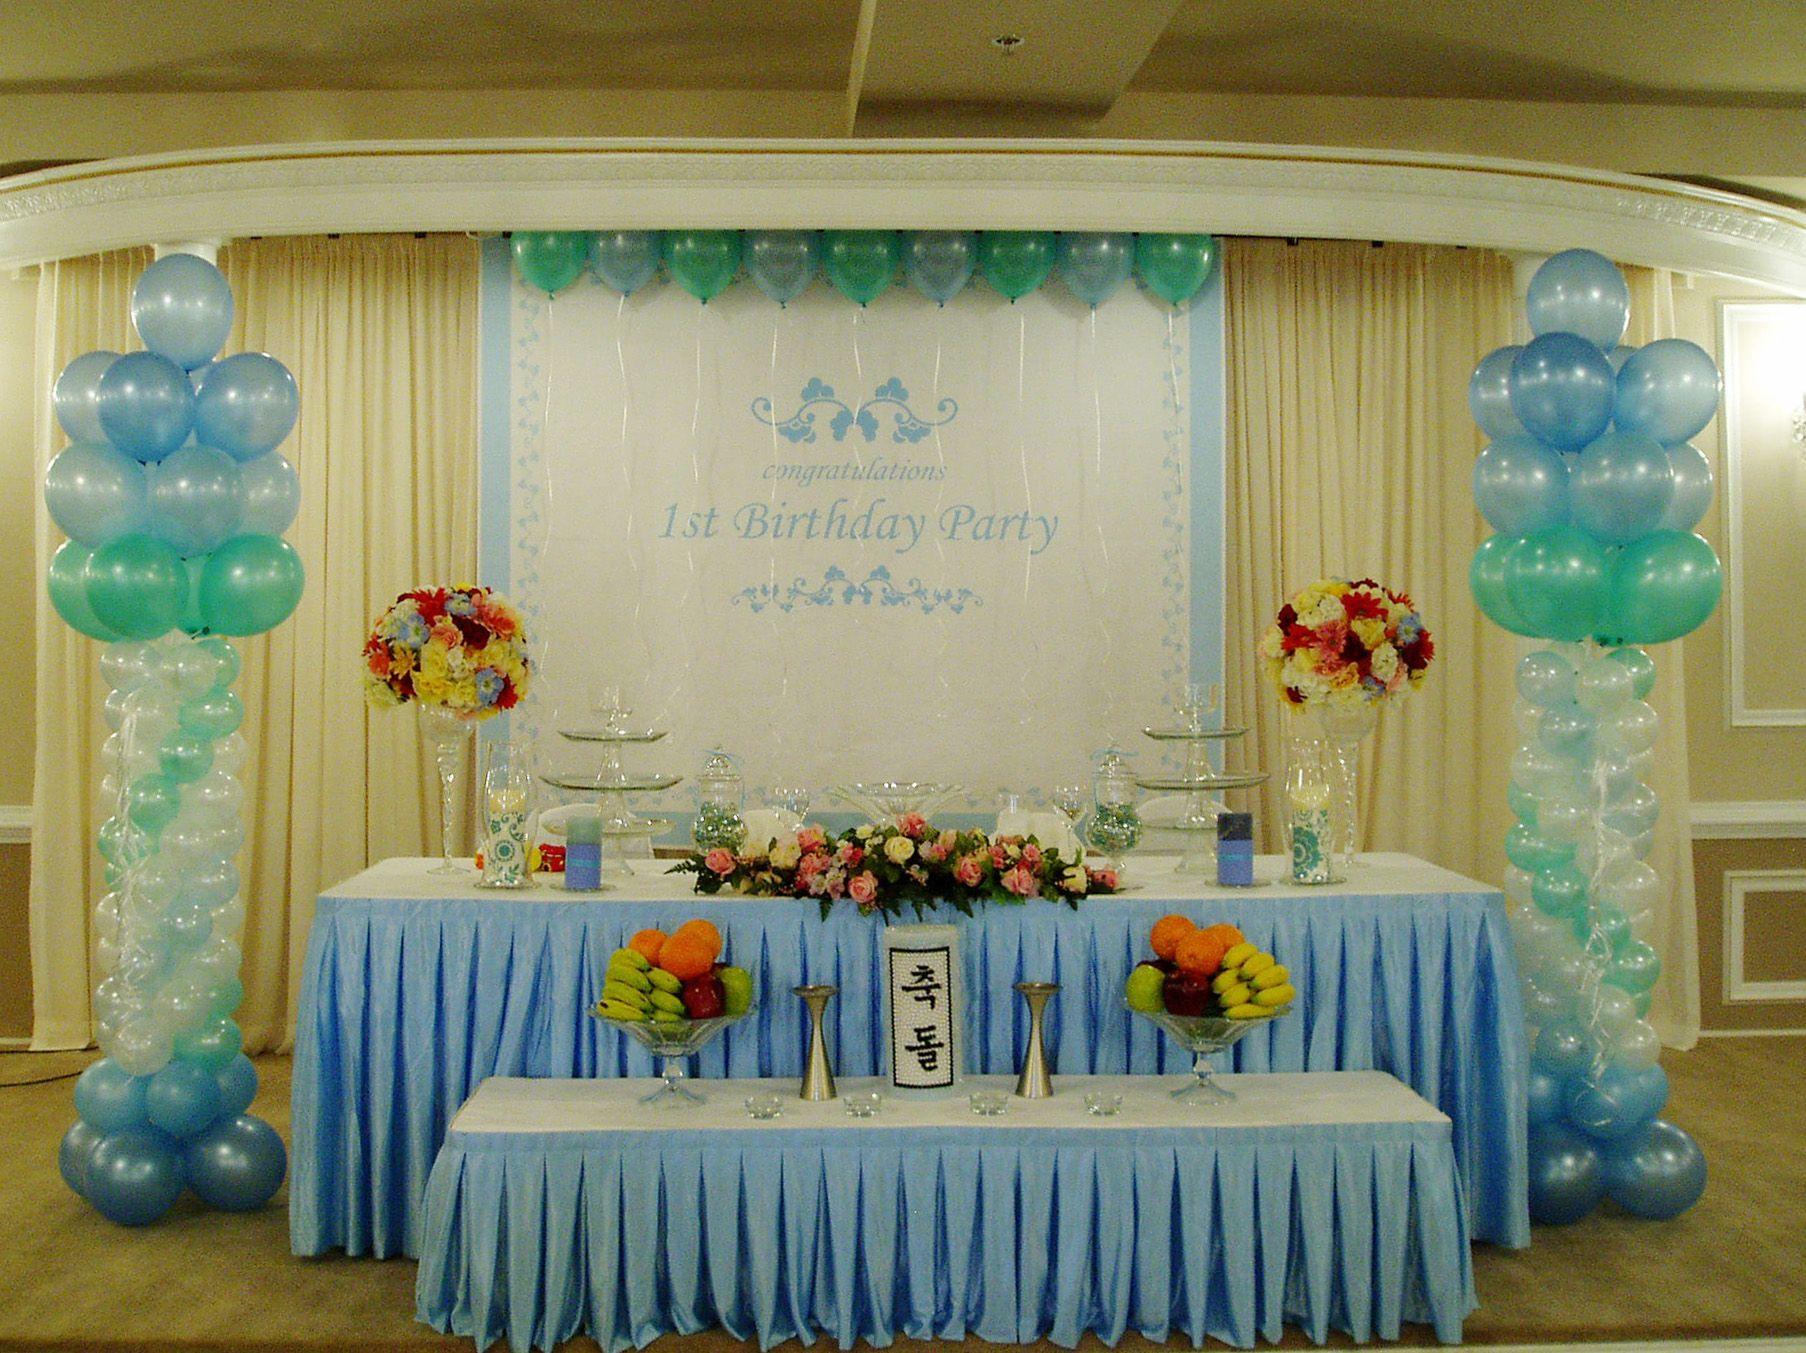 Birthday Table Setting & Birthday Party Table Settings Elegant ...